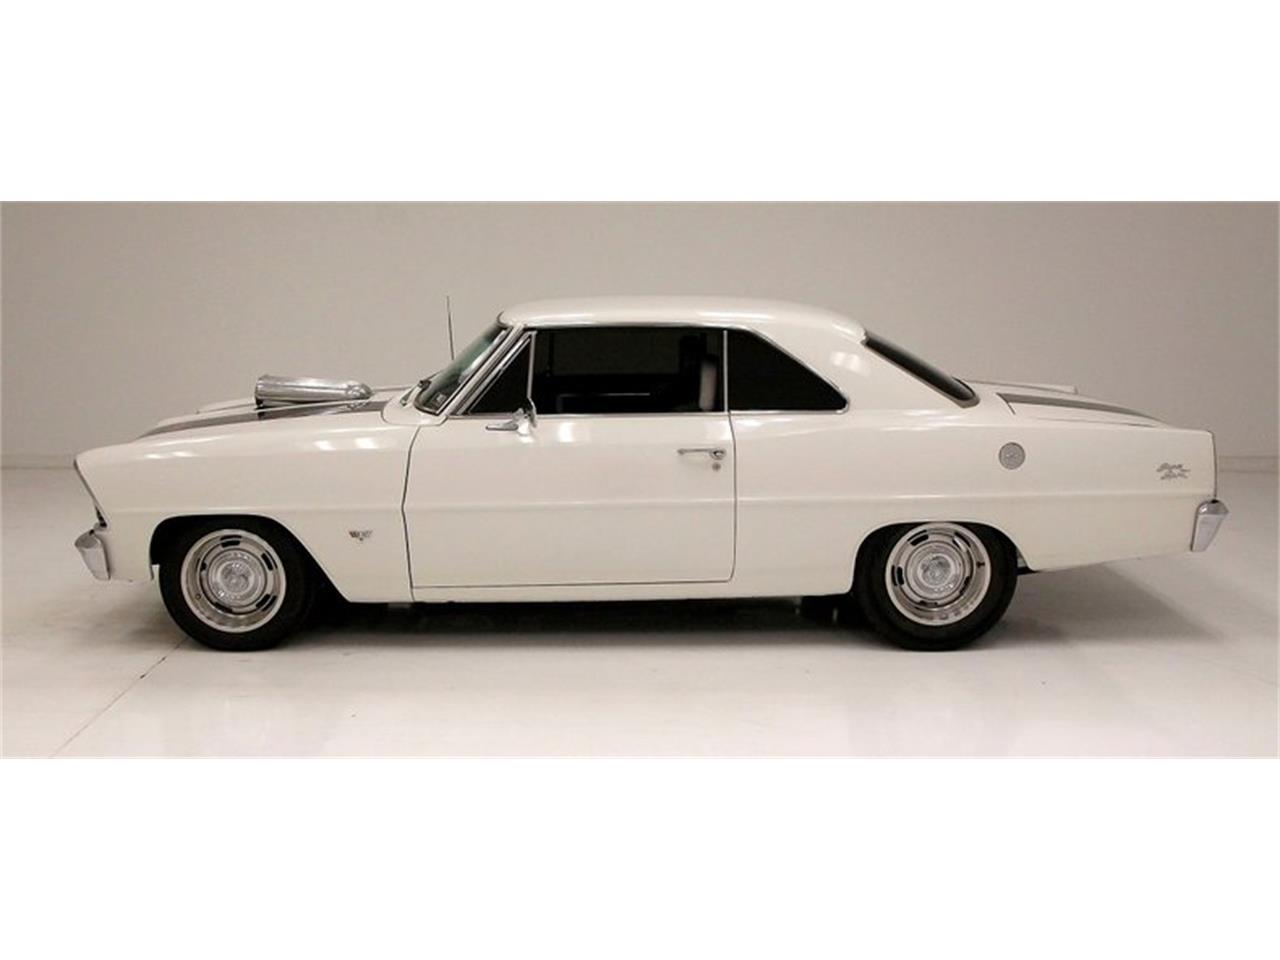 1967 Chevrolet Nova (CC-1255680) for sale in Morgantown, Pennsylvania